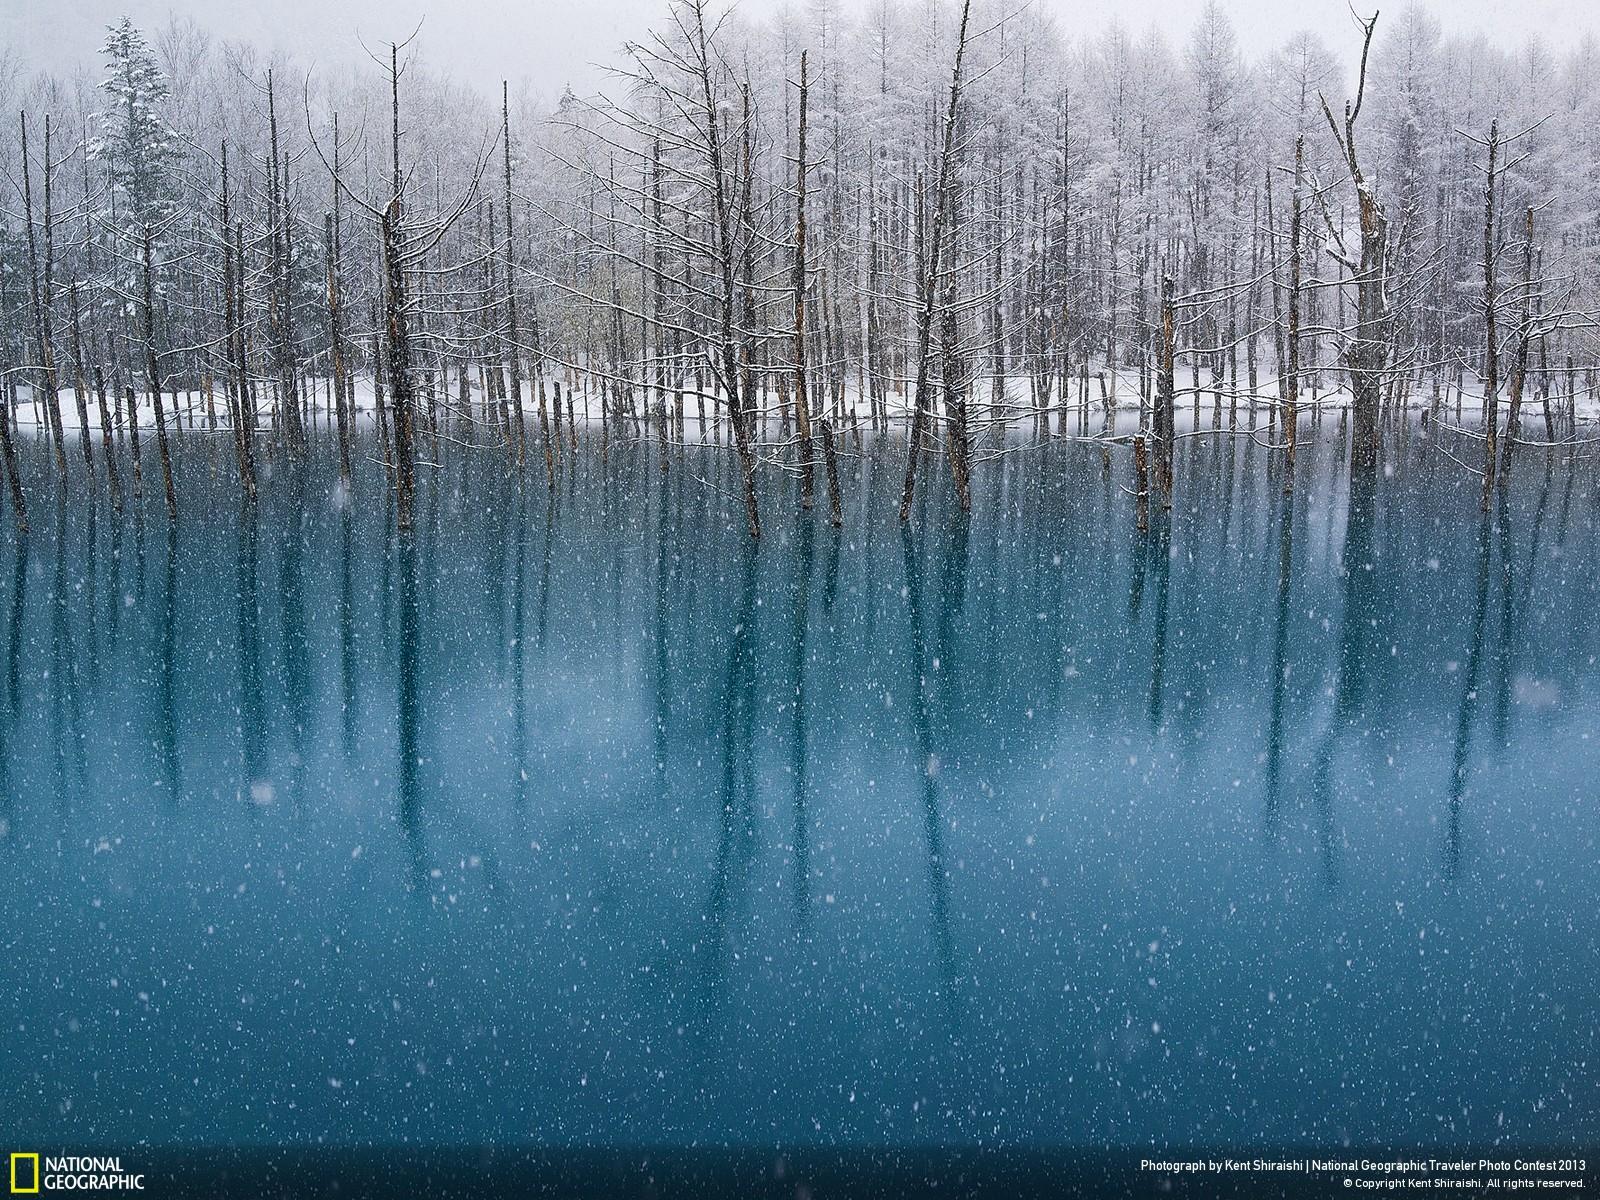 50 National Geographic Winter Wallpaper On Wallpapersafari